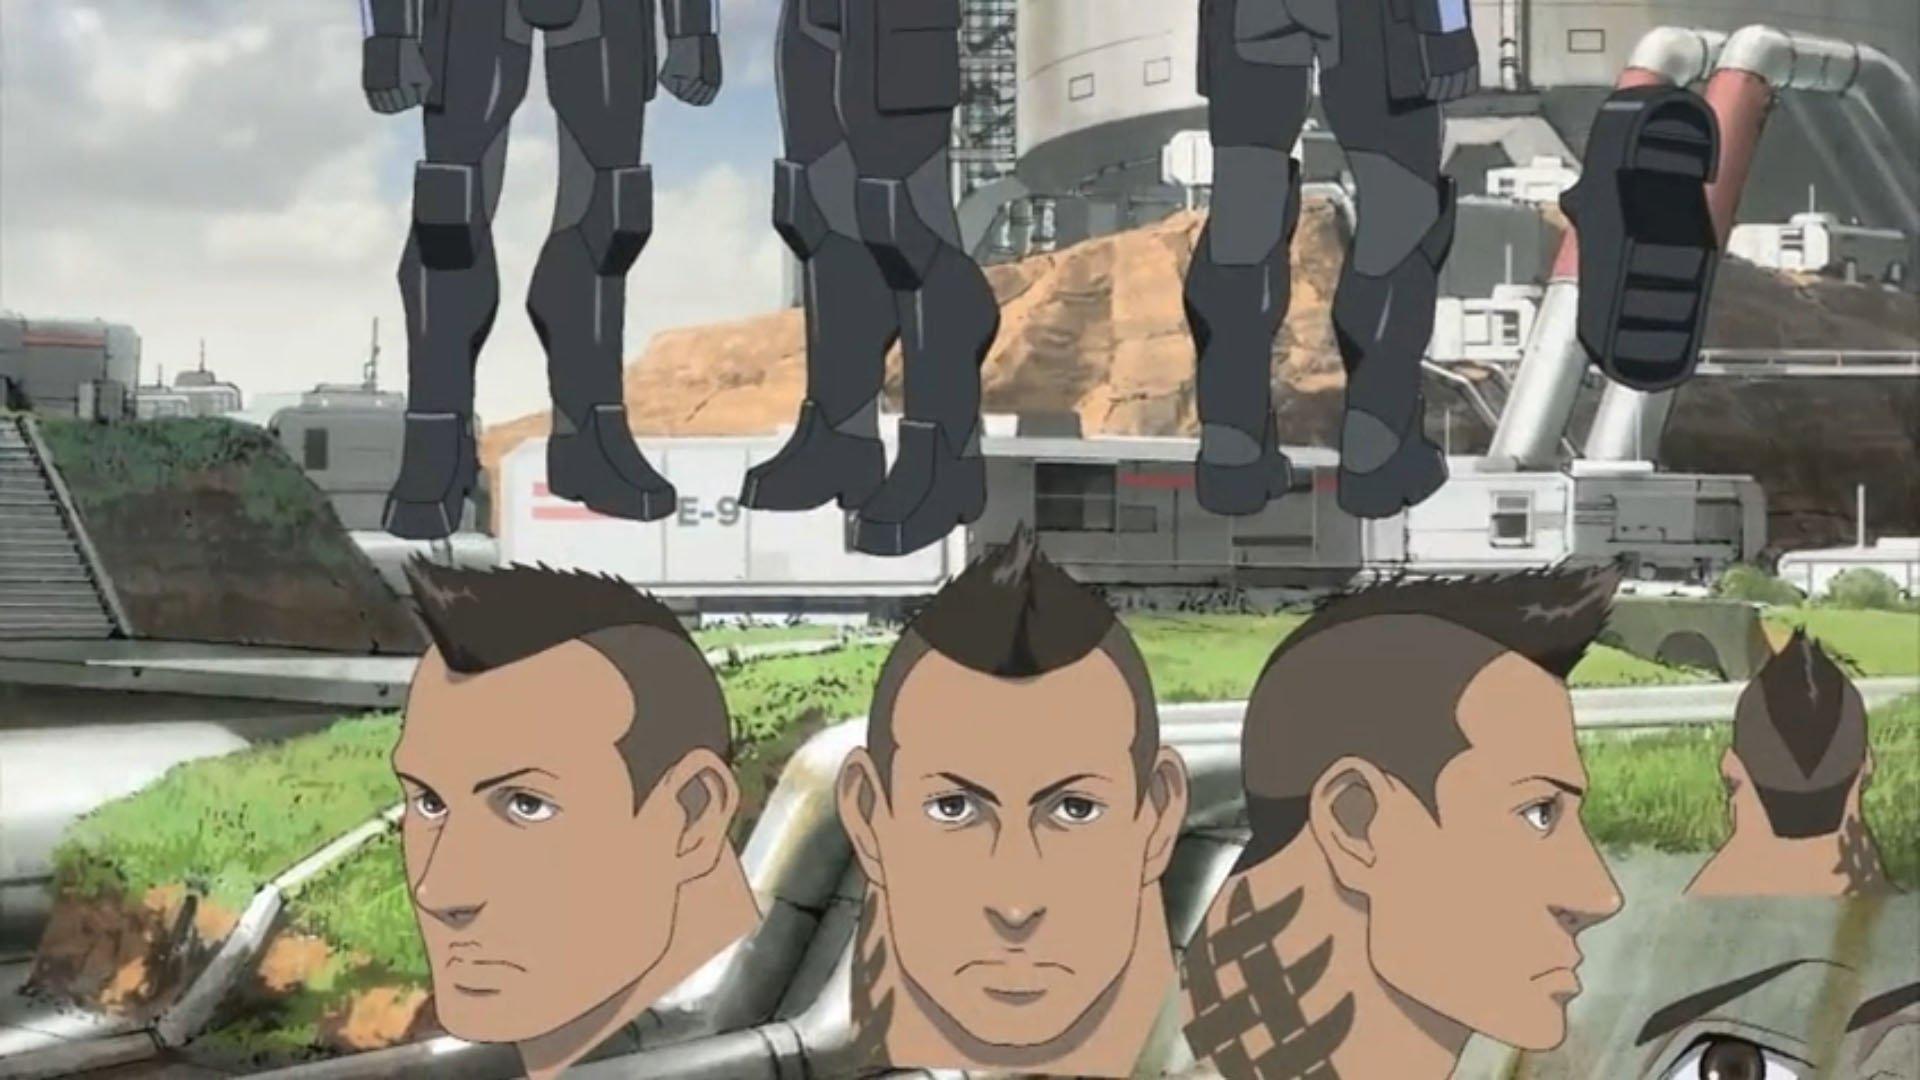 James Vega The Star Of Mass Effect Anime Film Gematsu